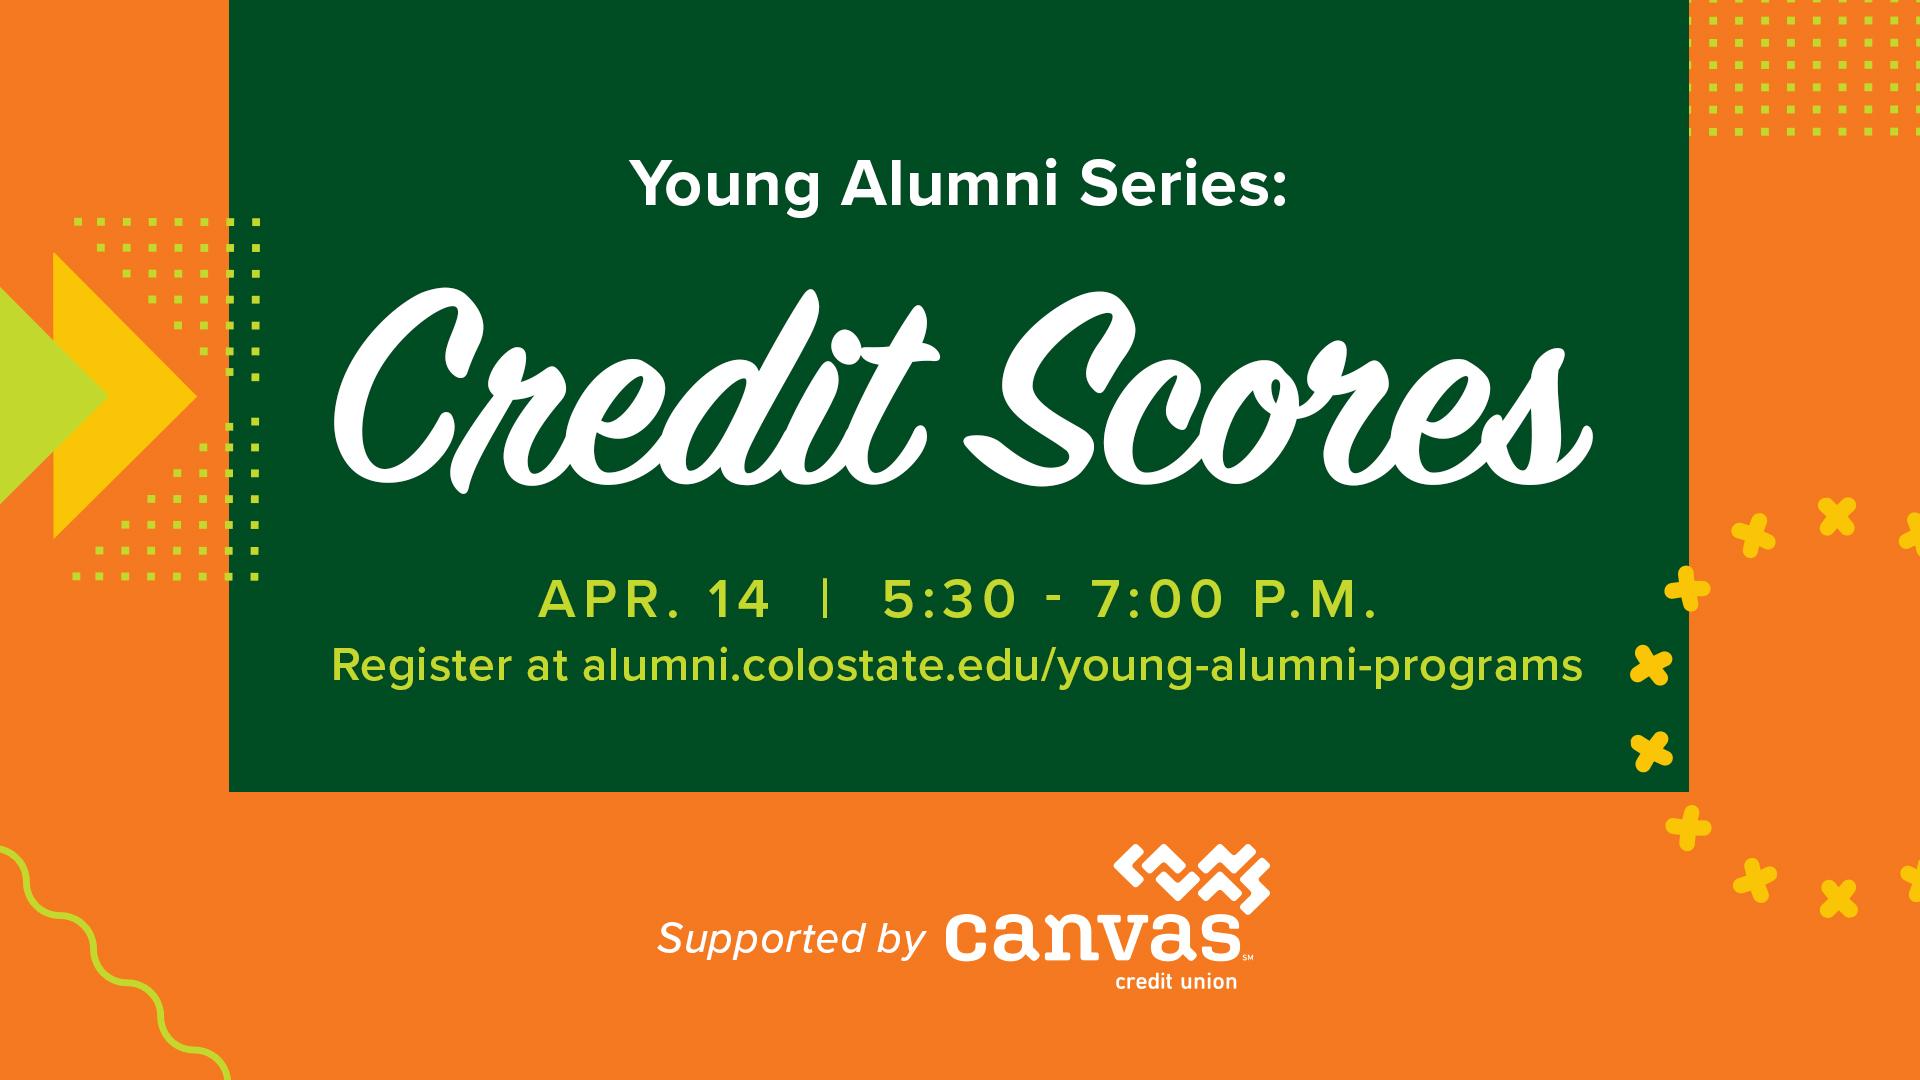 Image for Young Alumni Series: Credit Scores webinar